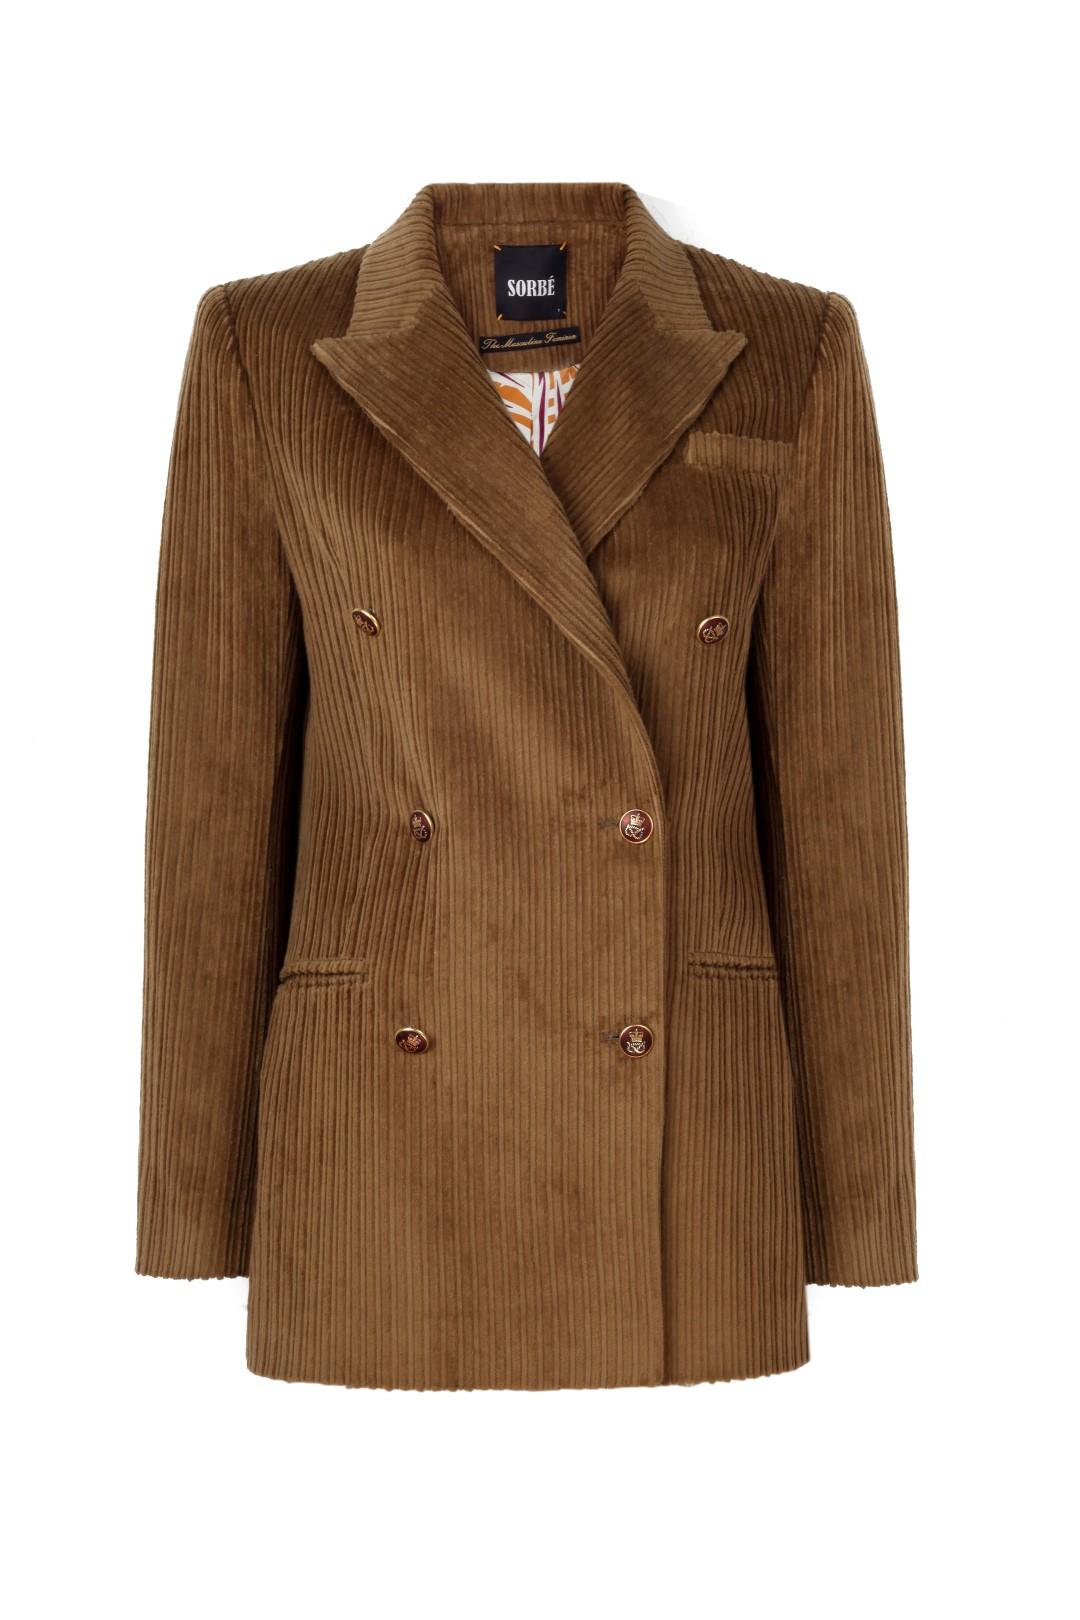 The Boyish Jacket by Sorbé on curated-crowd.com